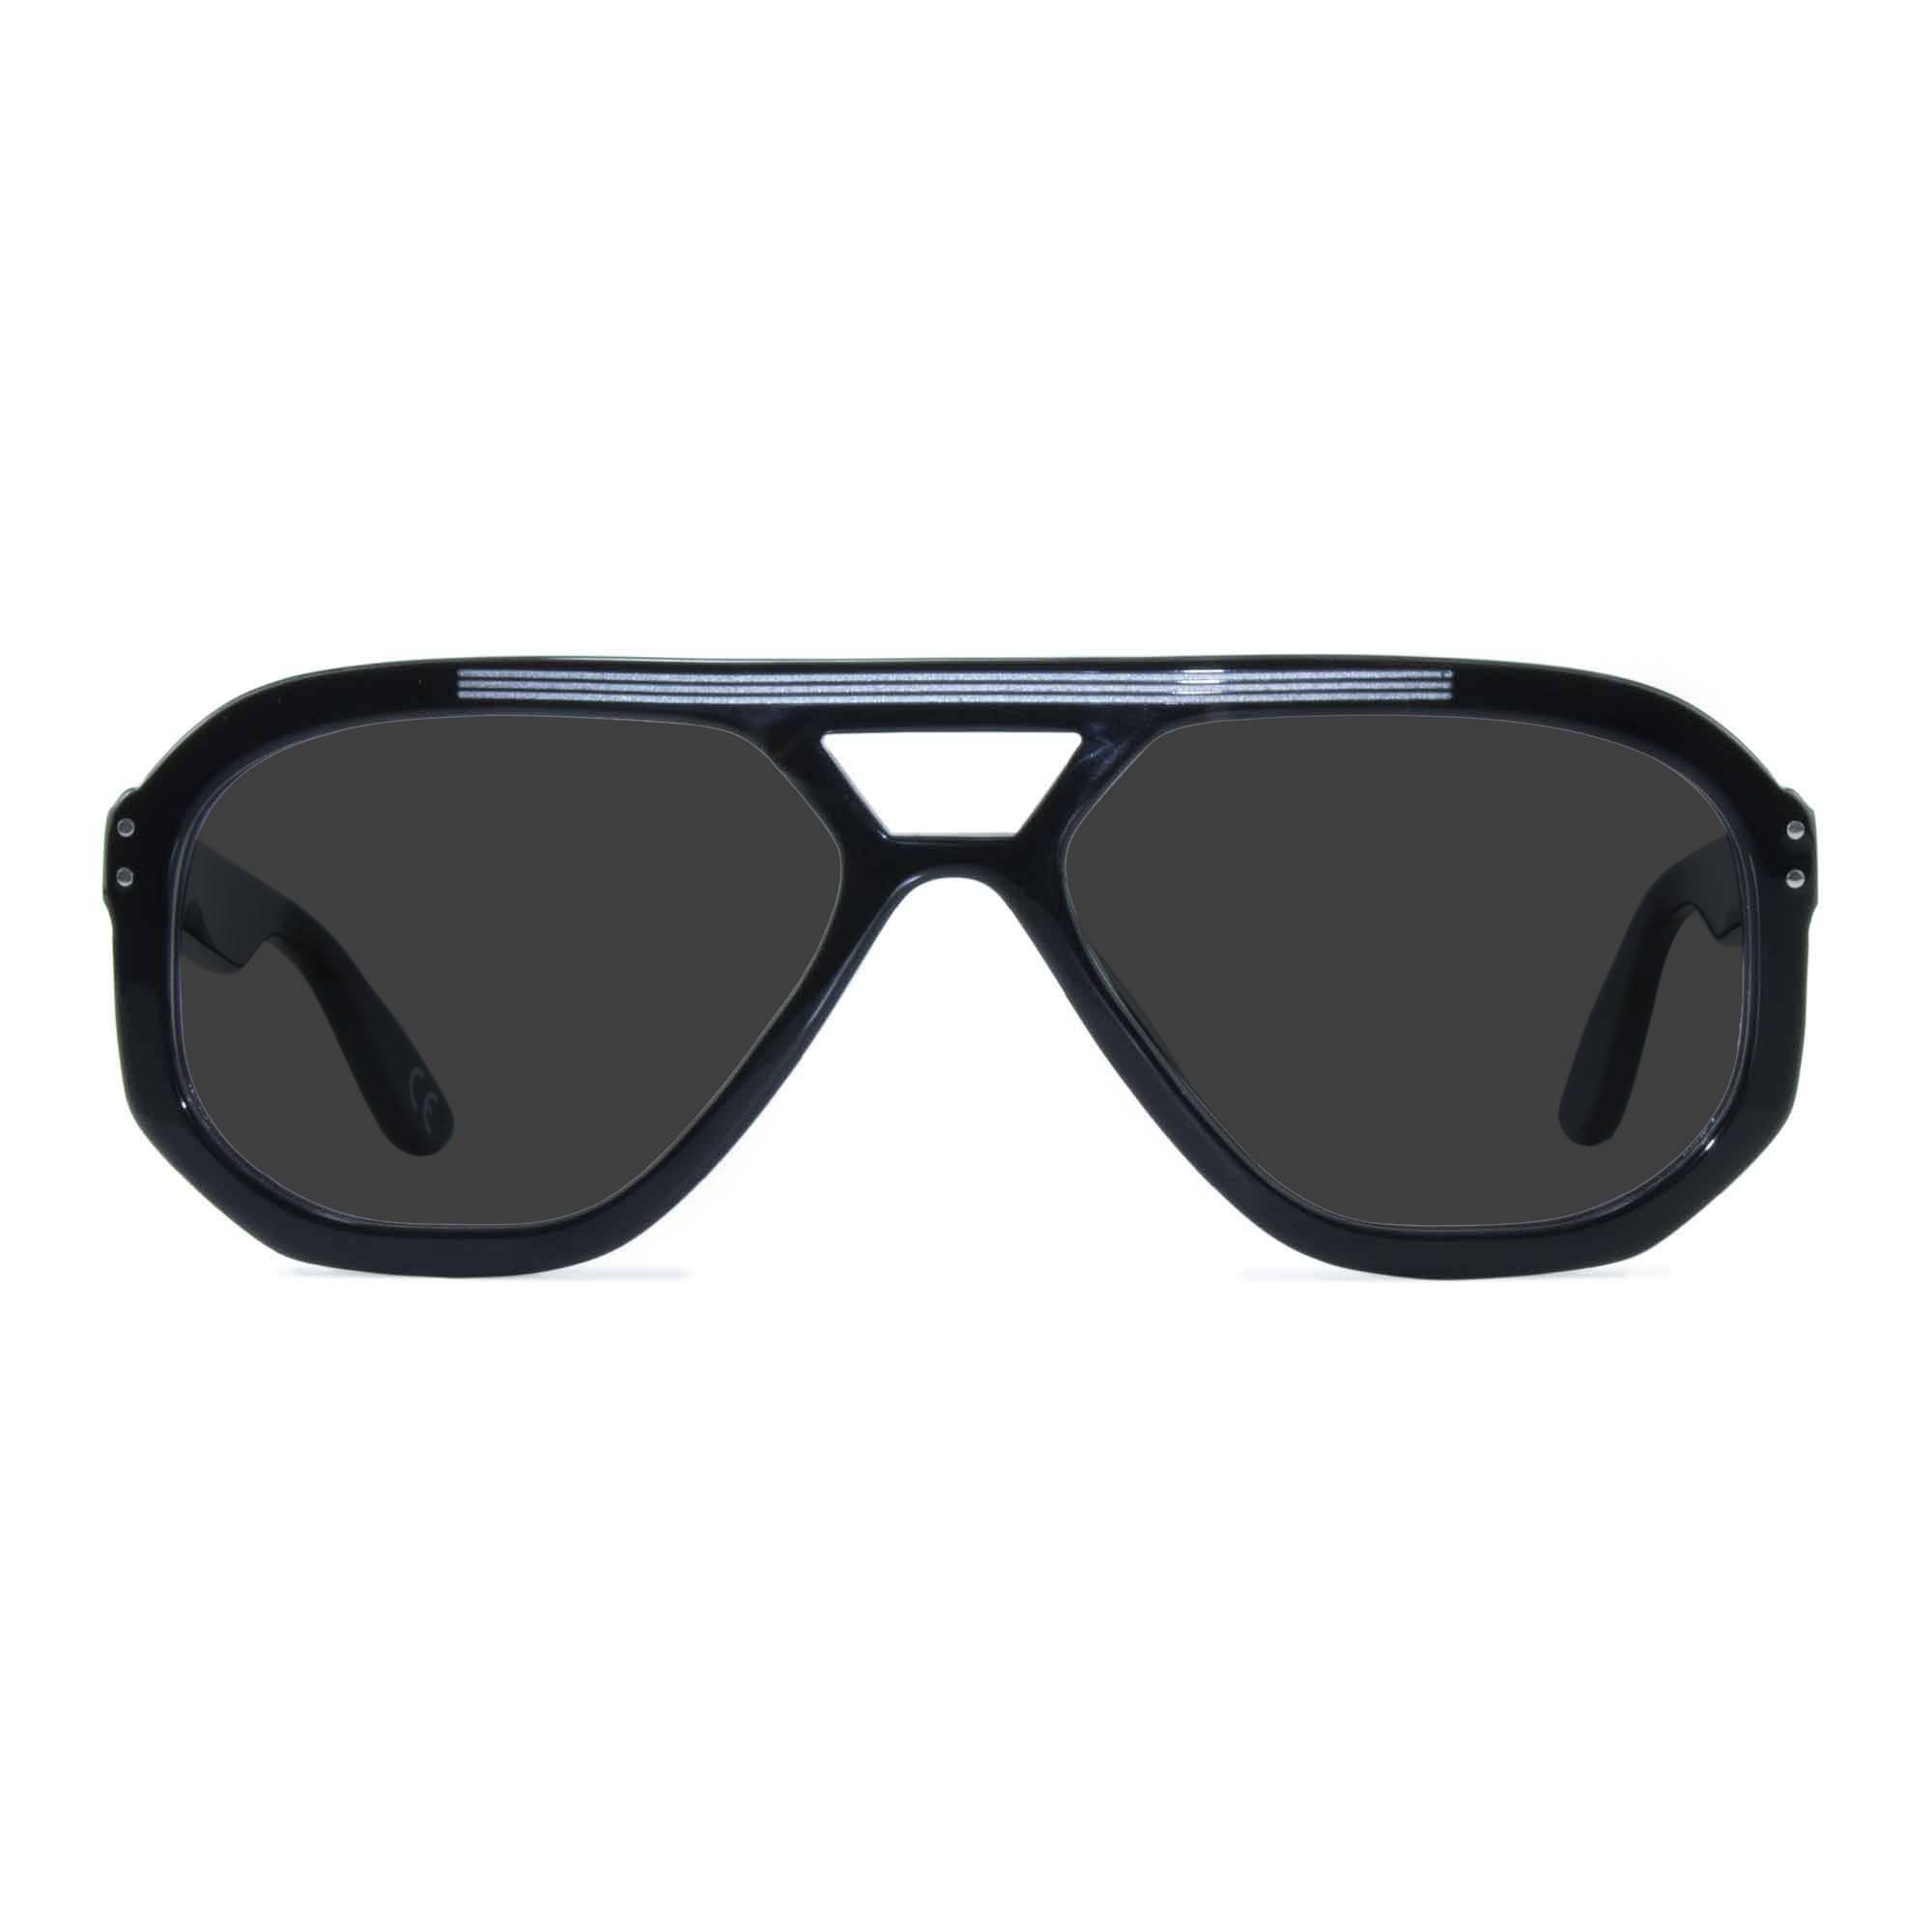 Joiuss jim black sunglasses